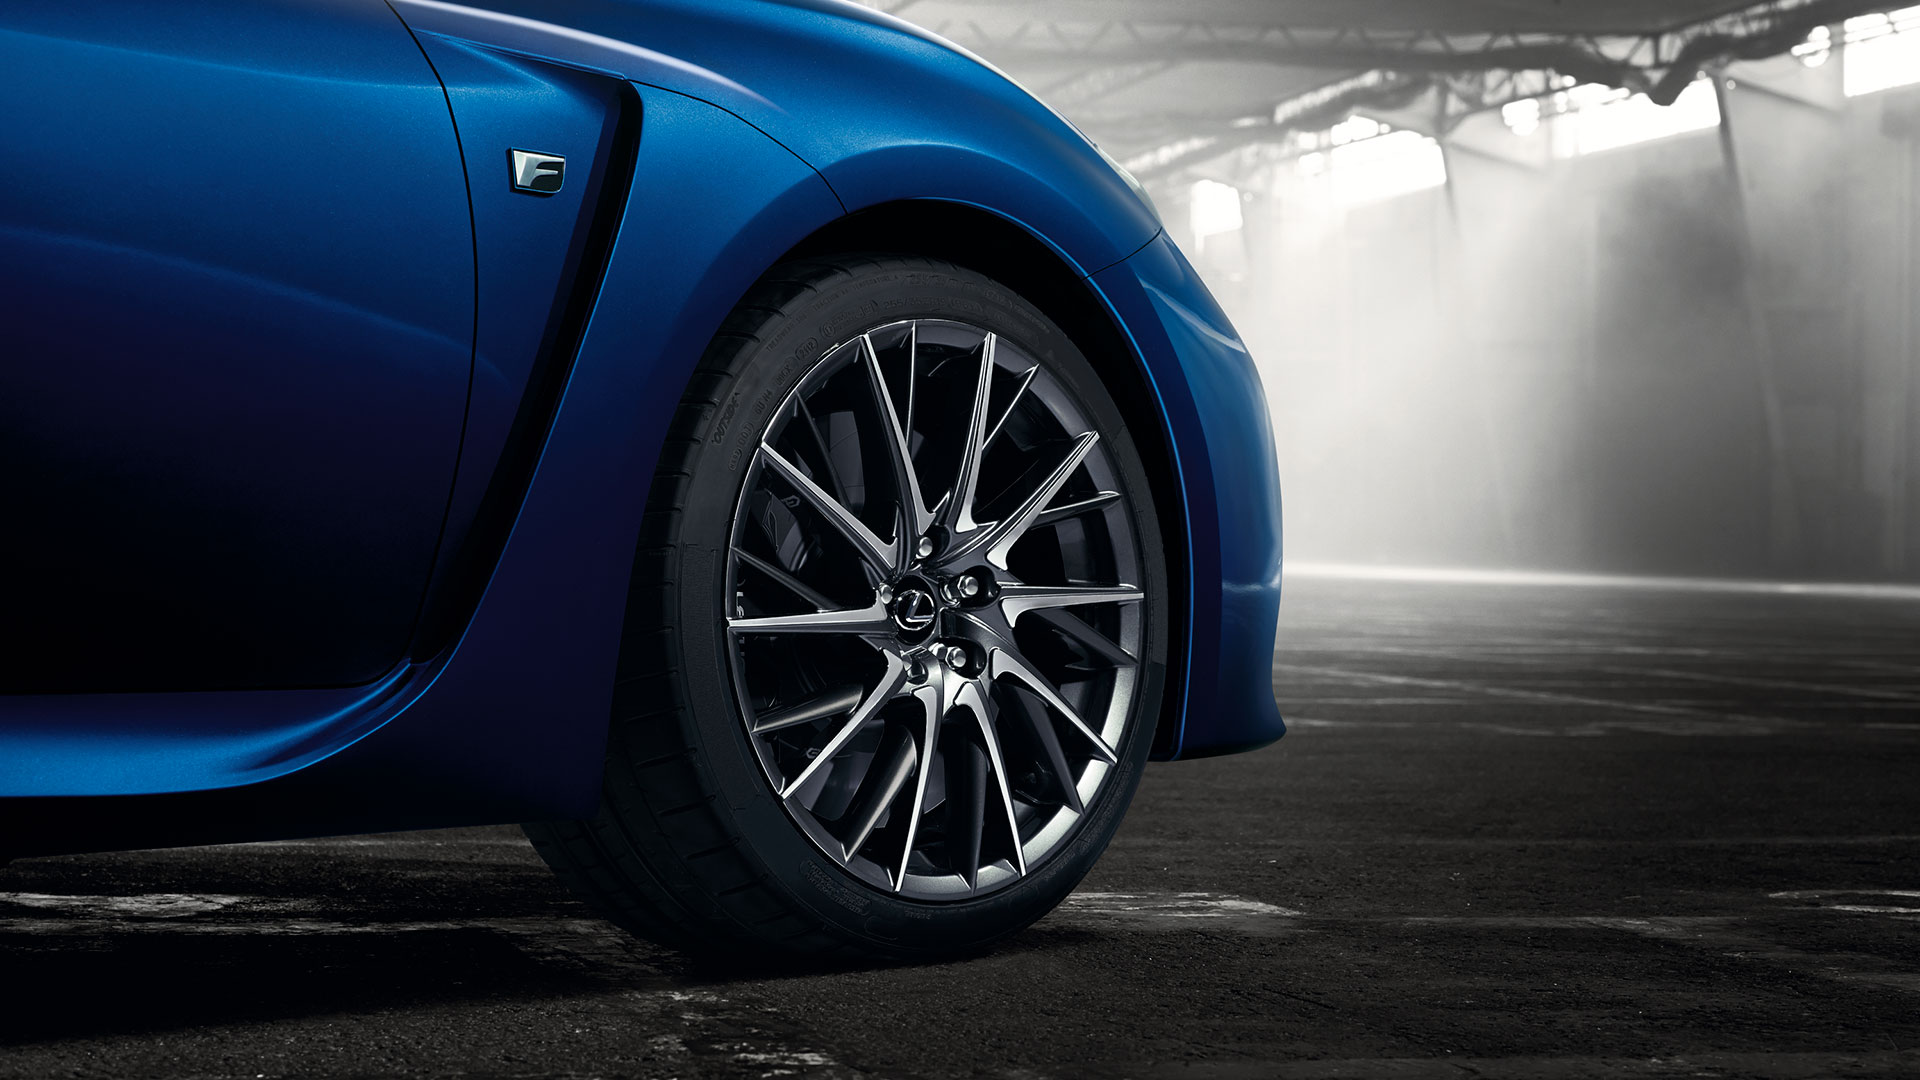 Lexus F Detroit hero asset